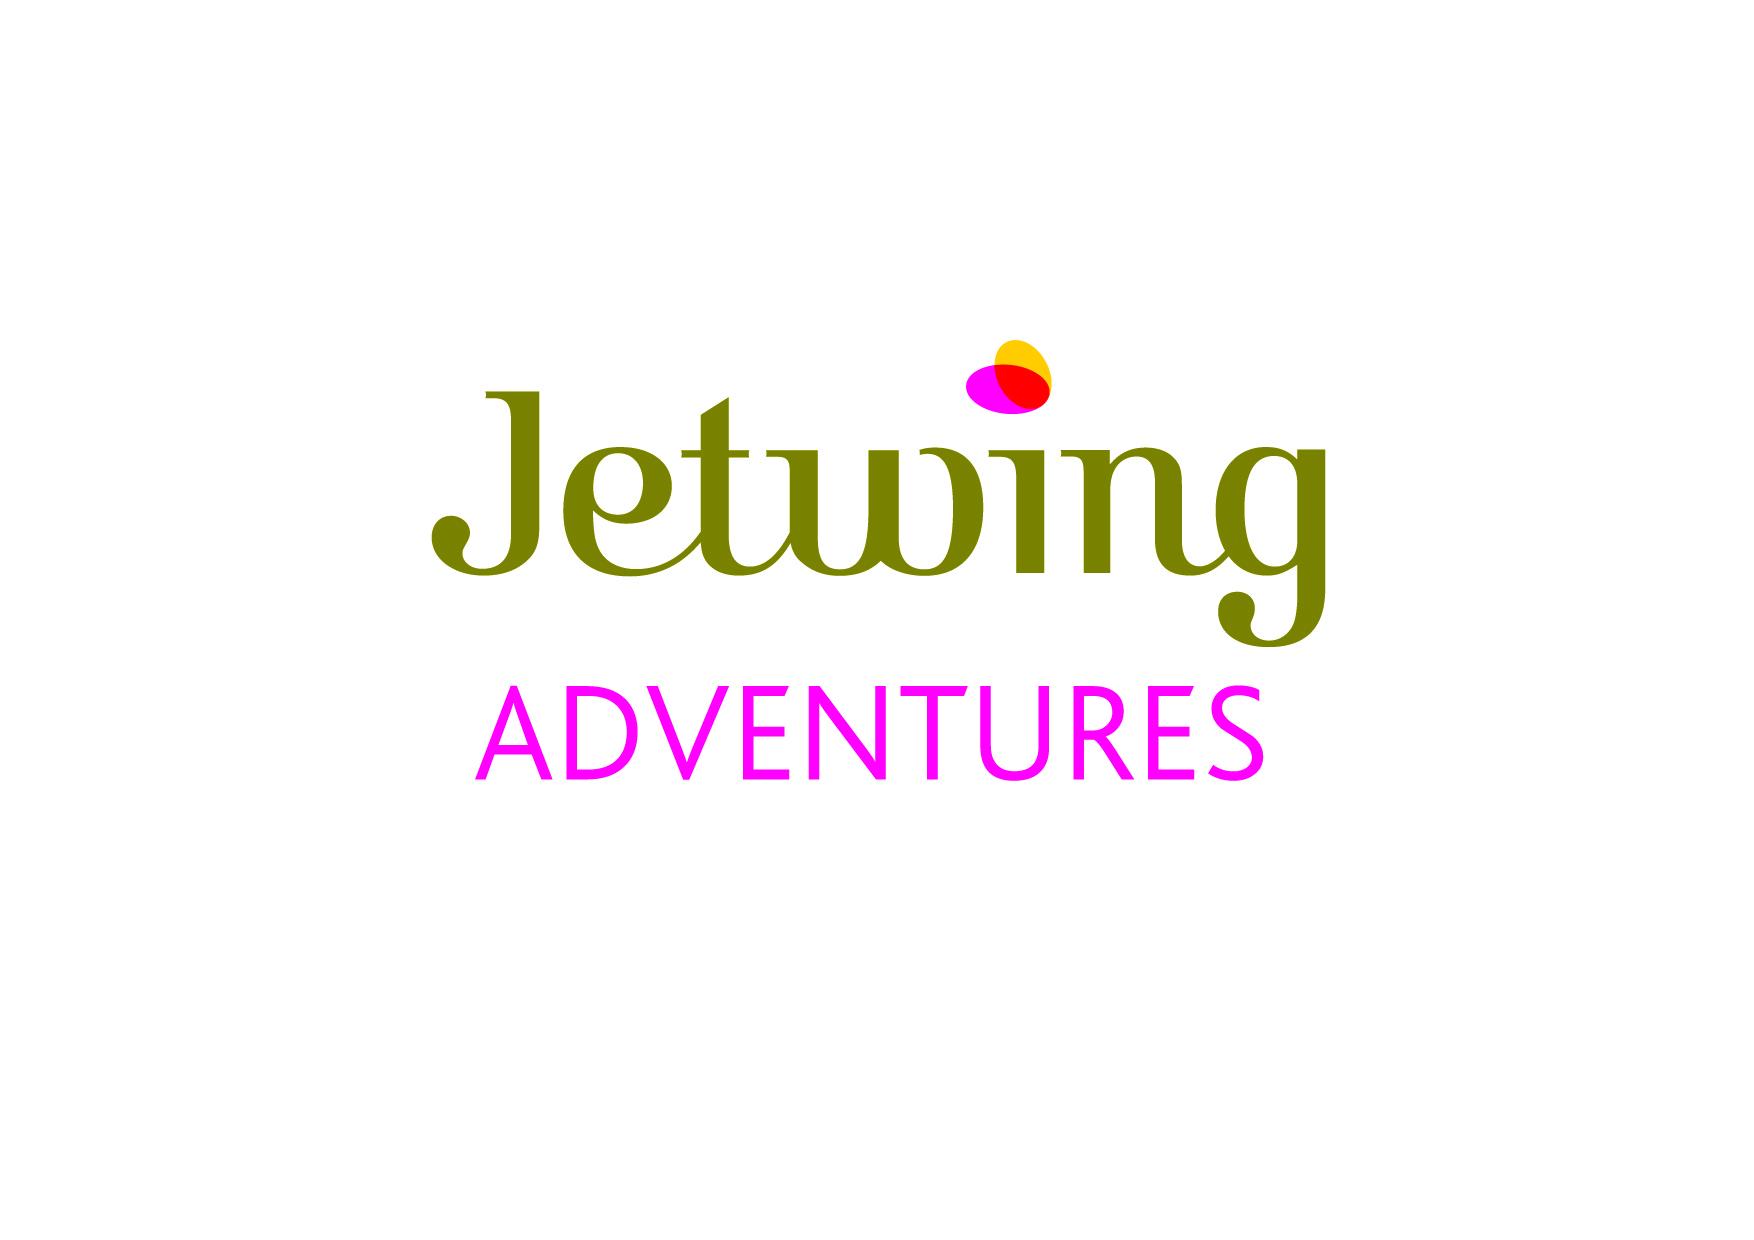 Jetwing Adventures